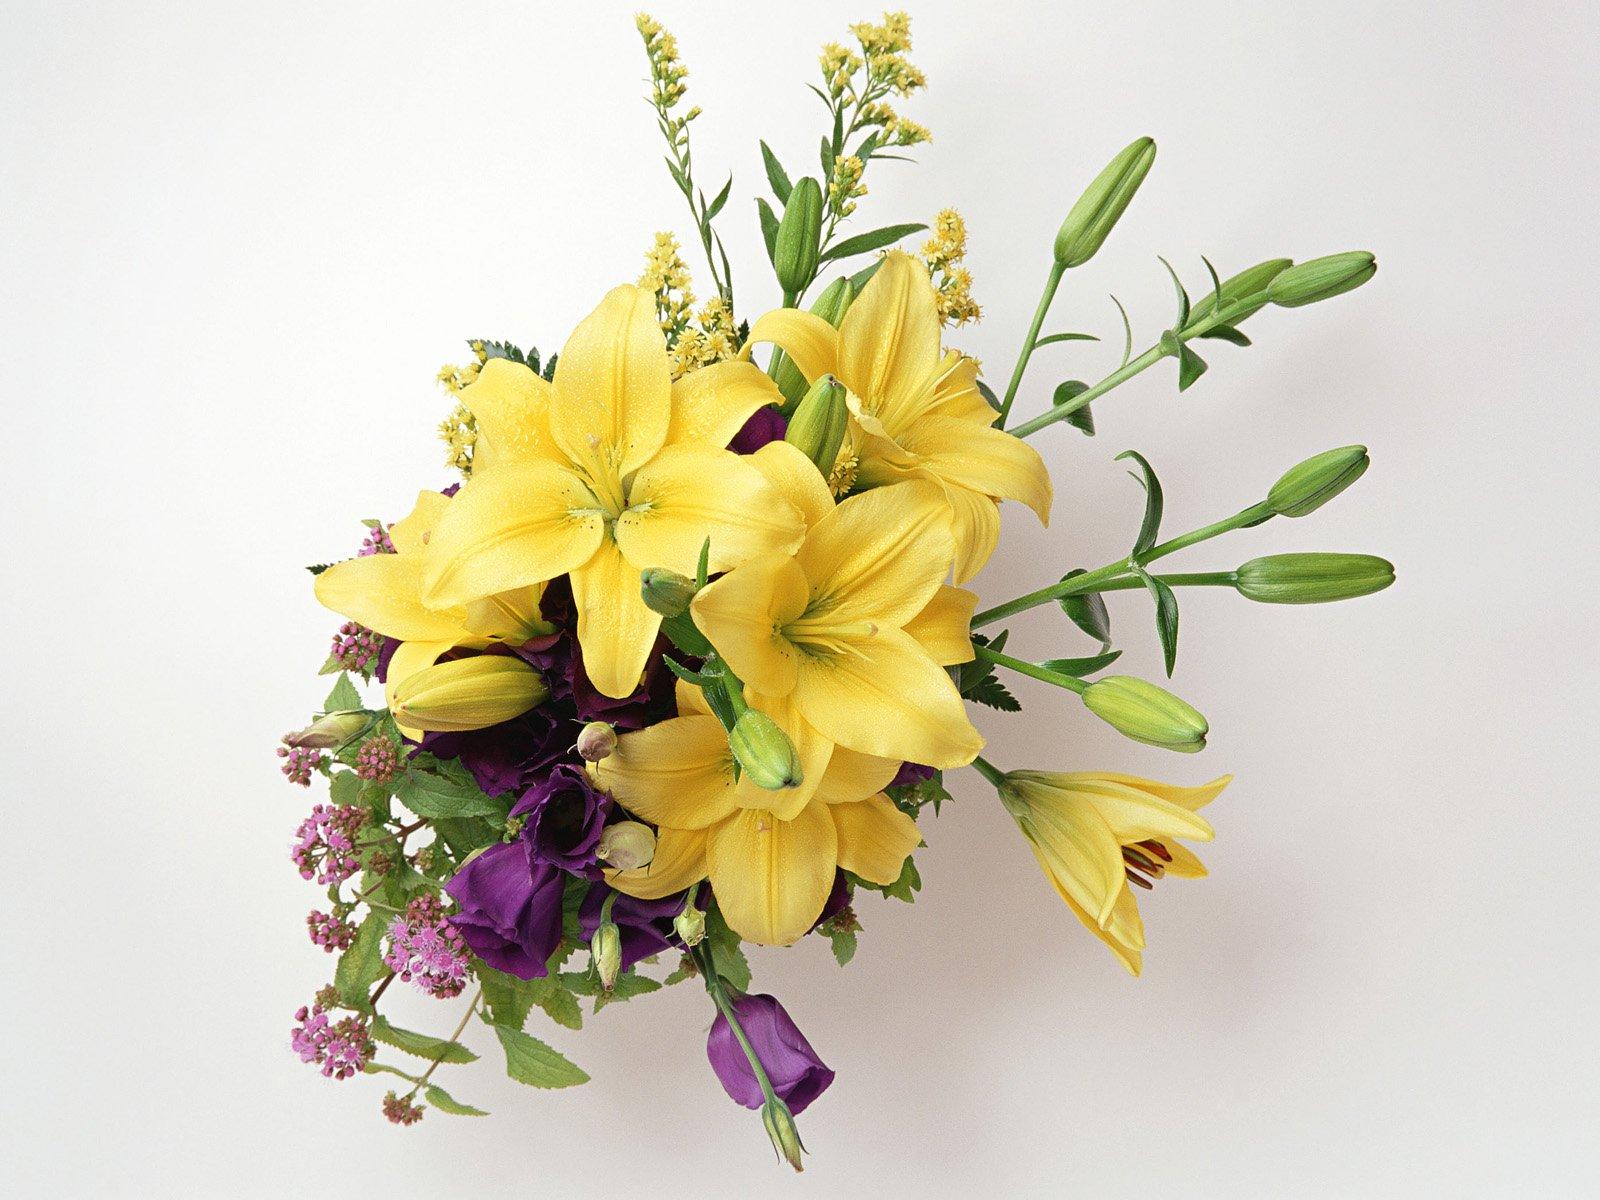 http://2.bp.blogspot.com/-R8uG7aLxgU4/TZj5SzOMhcI/AAAAAAAAANY/L4oZToZZDIc/s1600/Beautiful_Flowers_9954_1600_1200.jpg